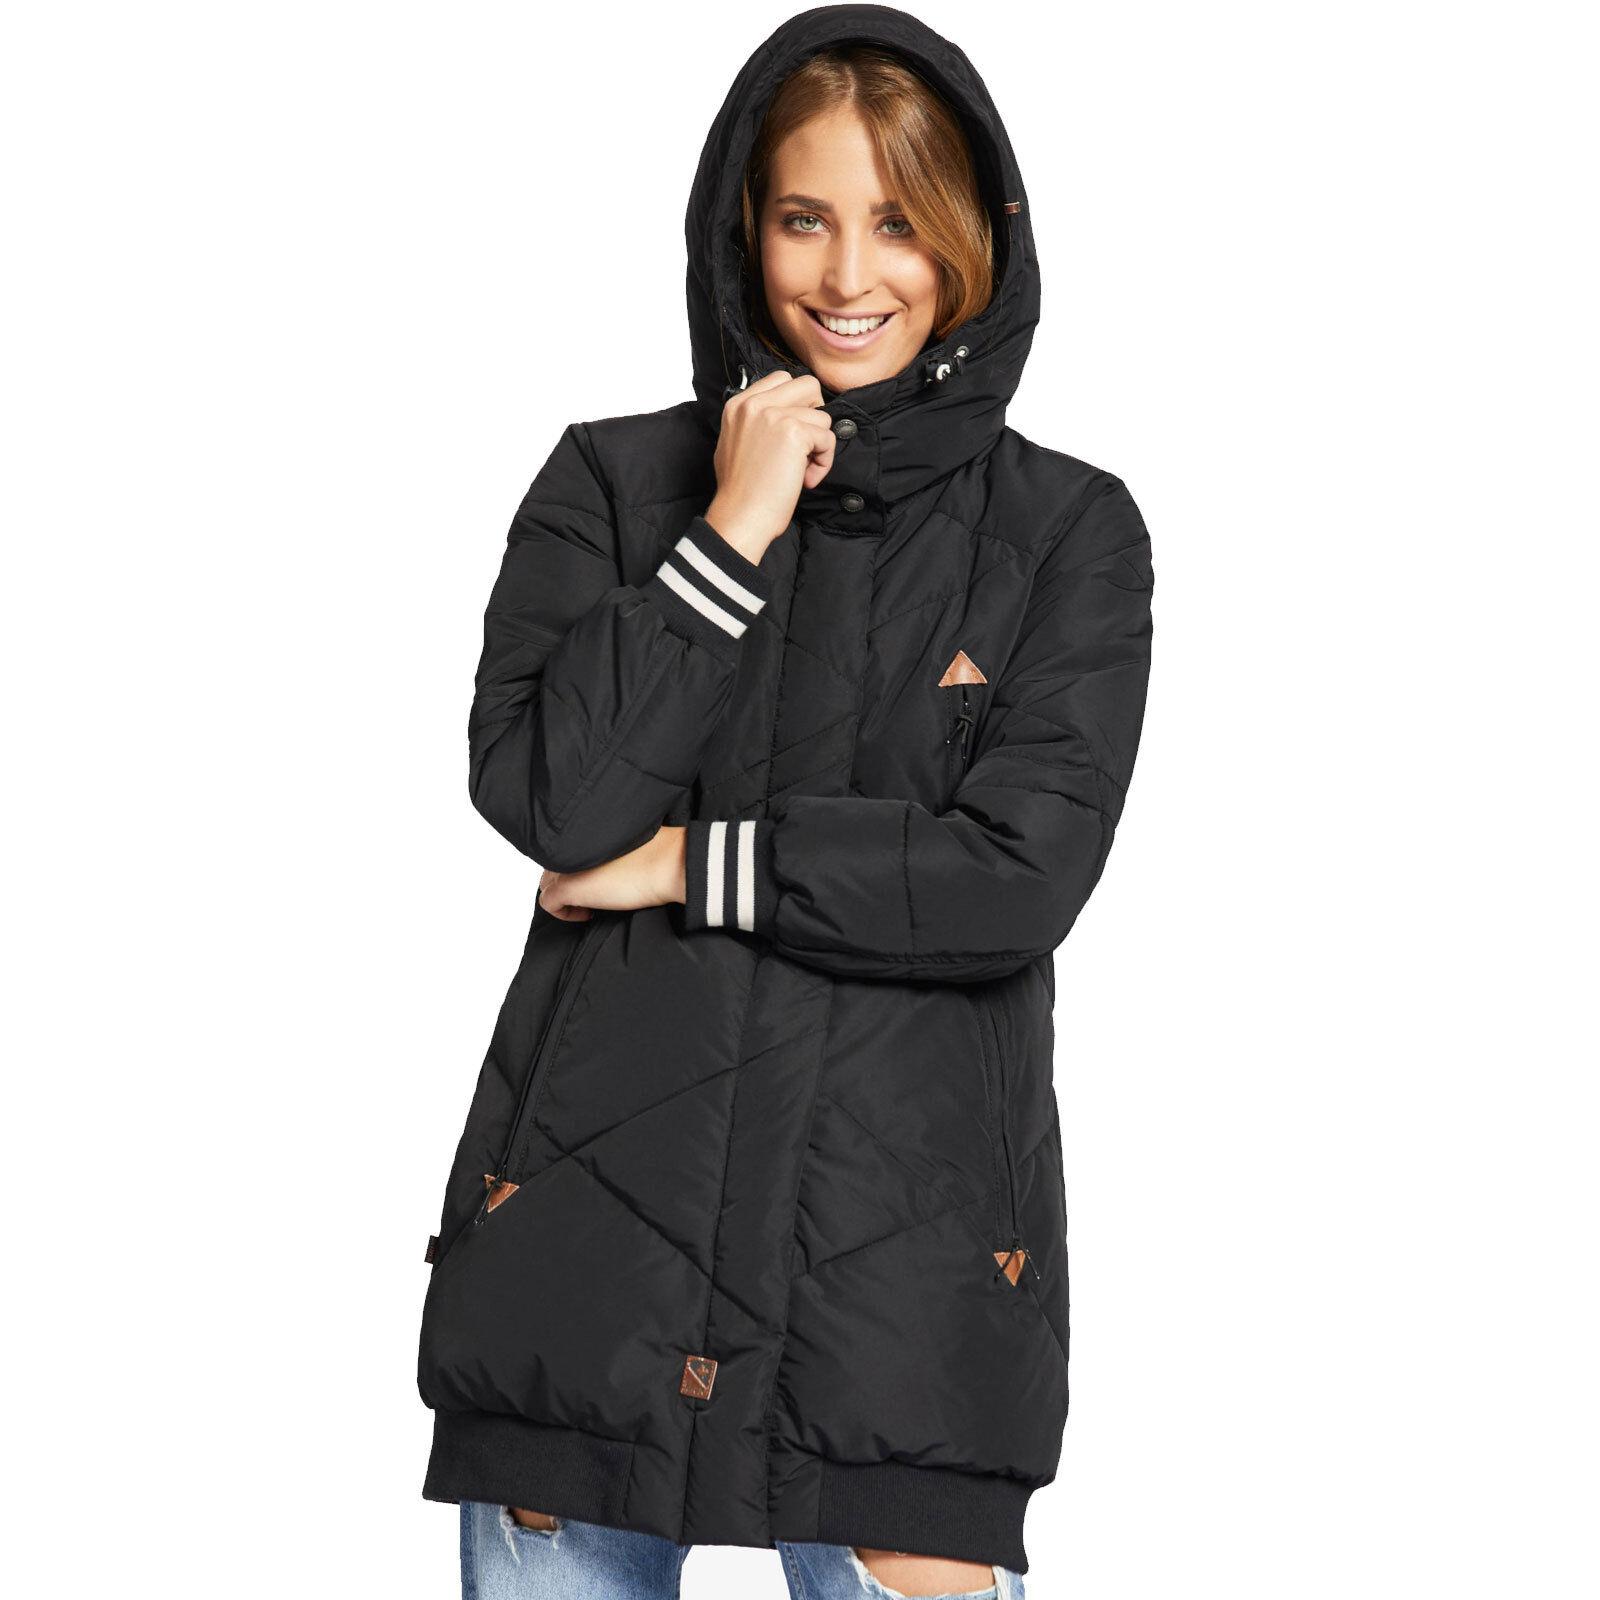 Uomo Fashion Fashion Uomo Cotton Padded Winter Warm Cappotto Turn-down Collar Parka Slim Fit 79b747